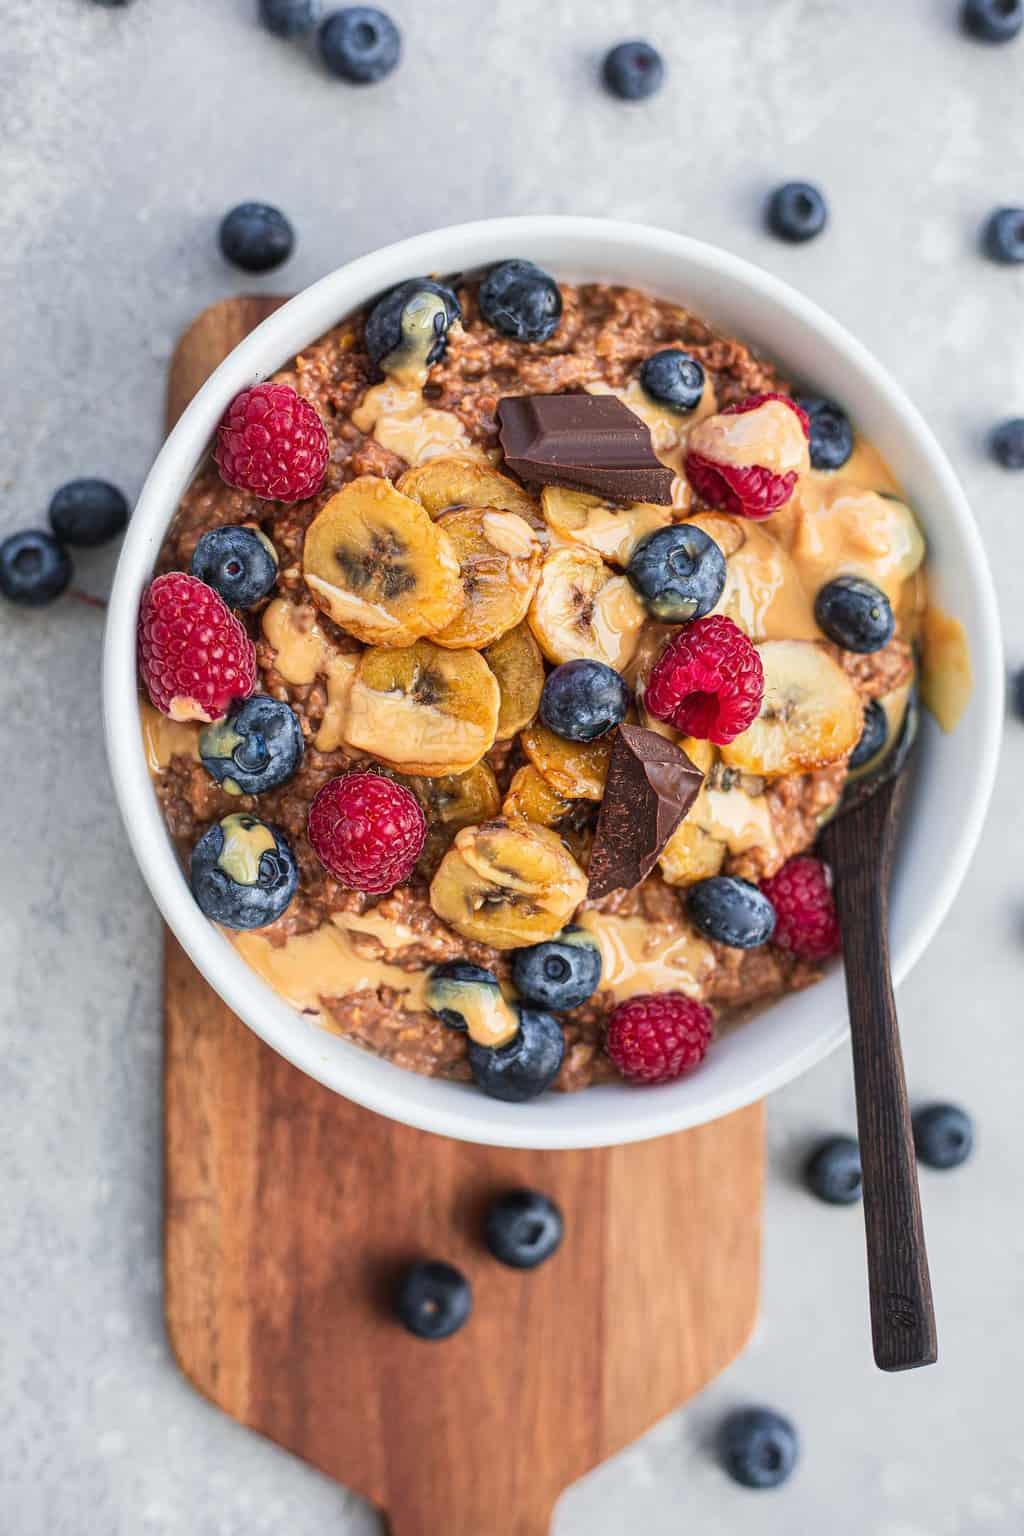 Vegan chocolate porridge with banana and fruit